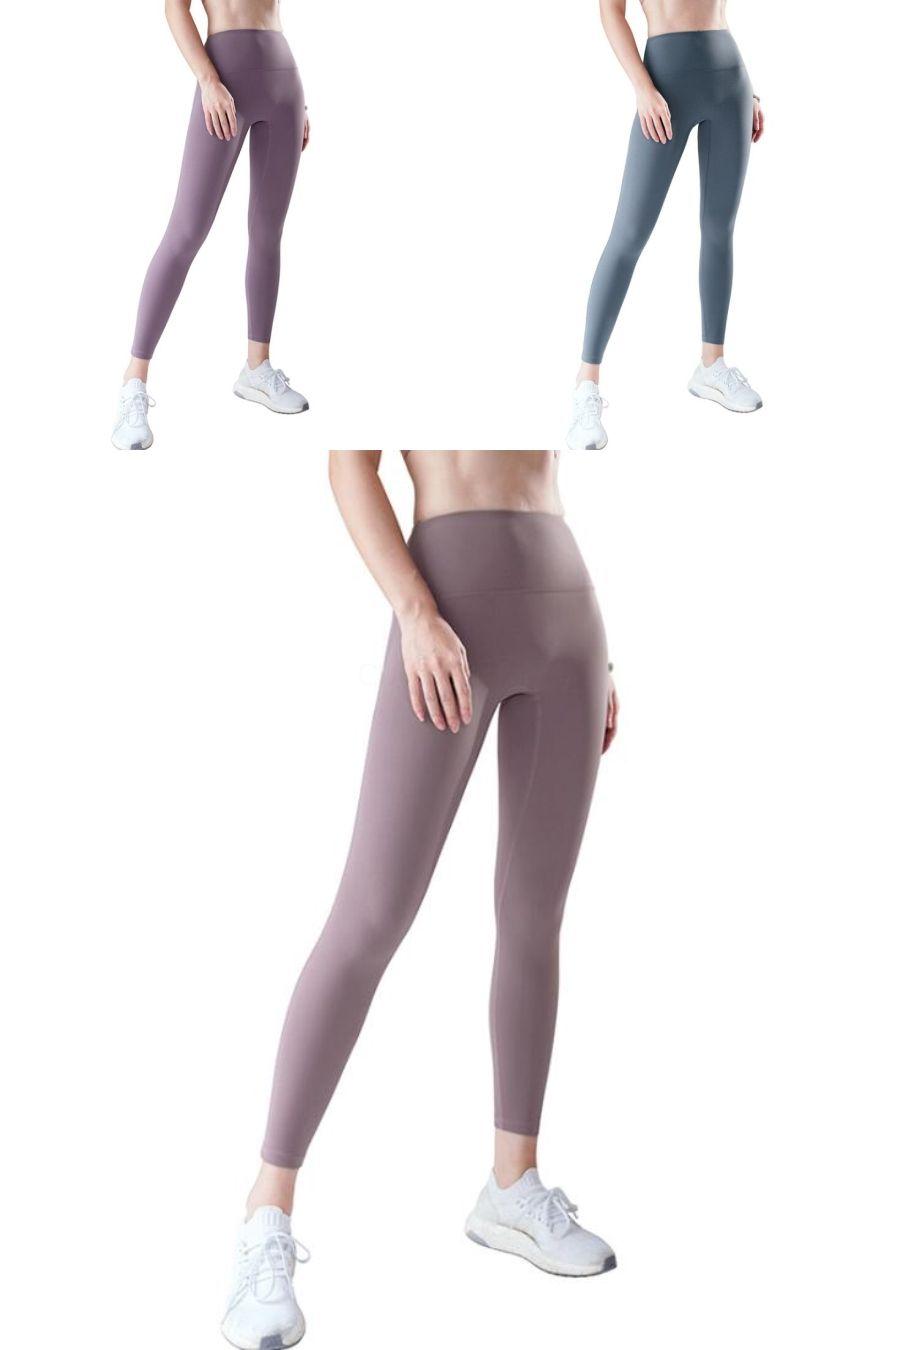 Yesello Igh cintura fina da aptidão Leggings Mulheres letra preta Imprimir Workout Legging Sporting Moda Leggings # 770